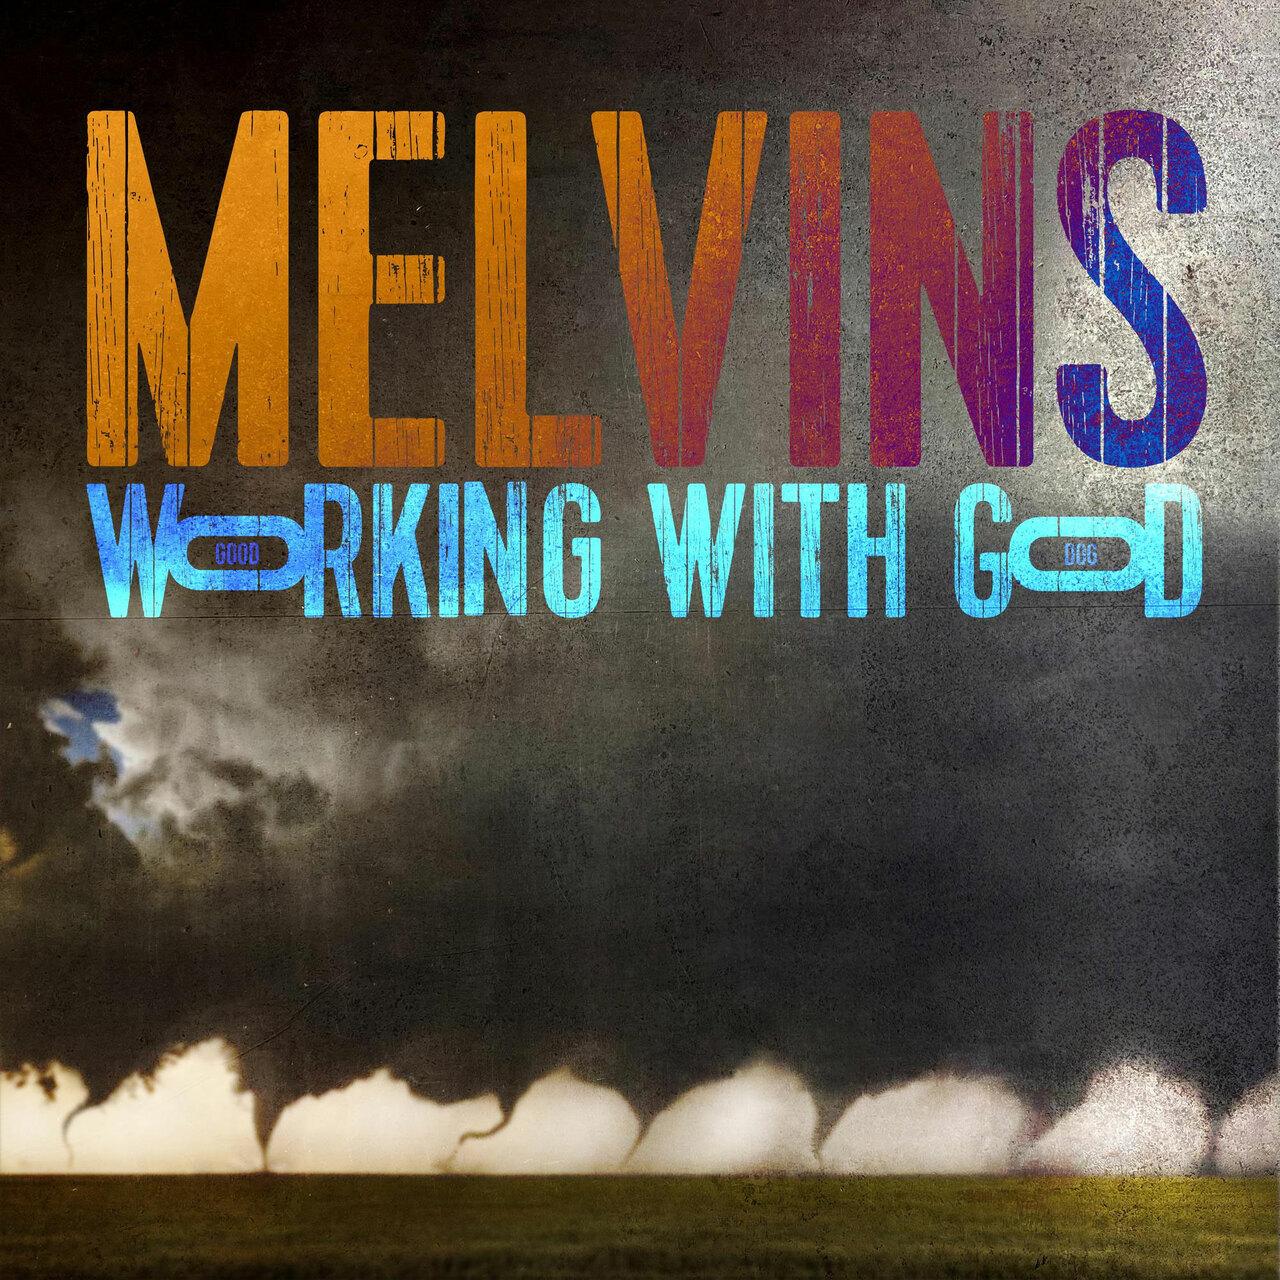 Melvins ปล่อยซิงเกิ้ลใหม่ The Great Good Place จากอัลบั้มใหม่ Working With God 5